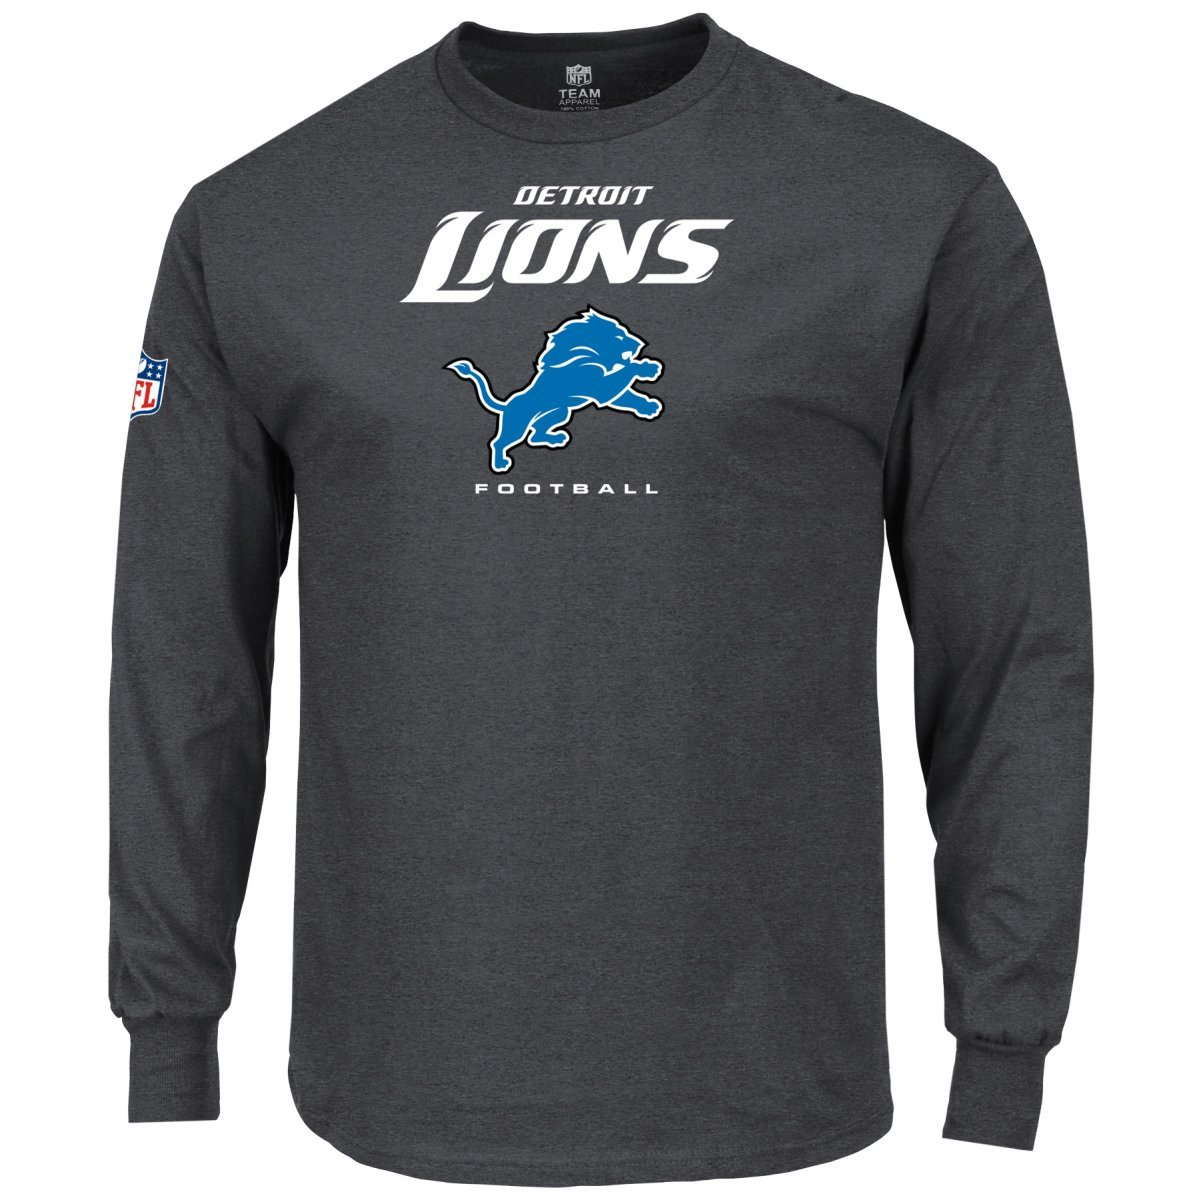 Detroit Lions Charcoal Majestic Our Team Longsleeve